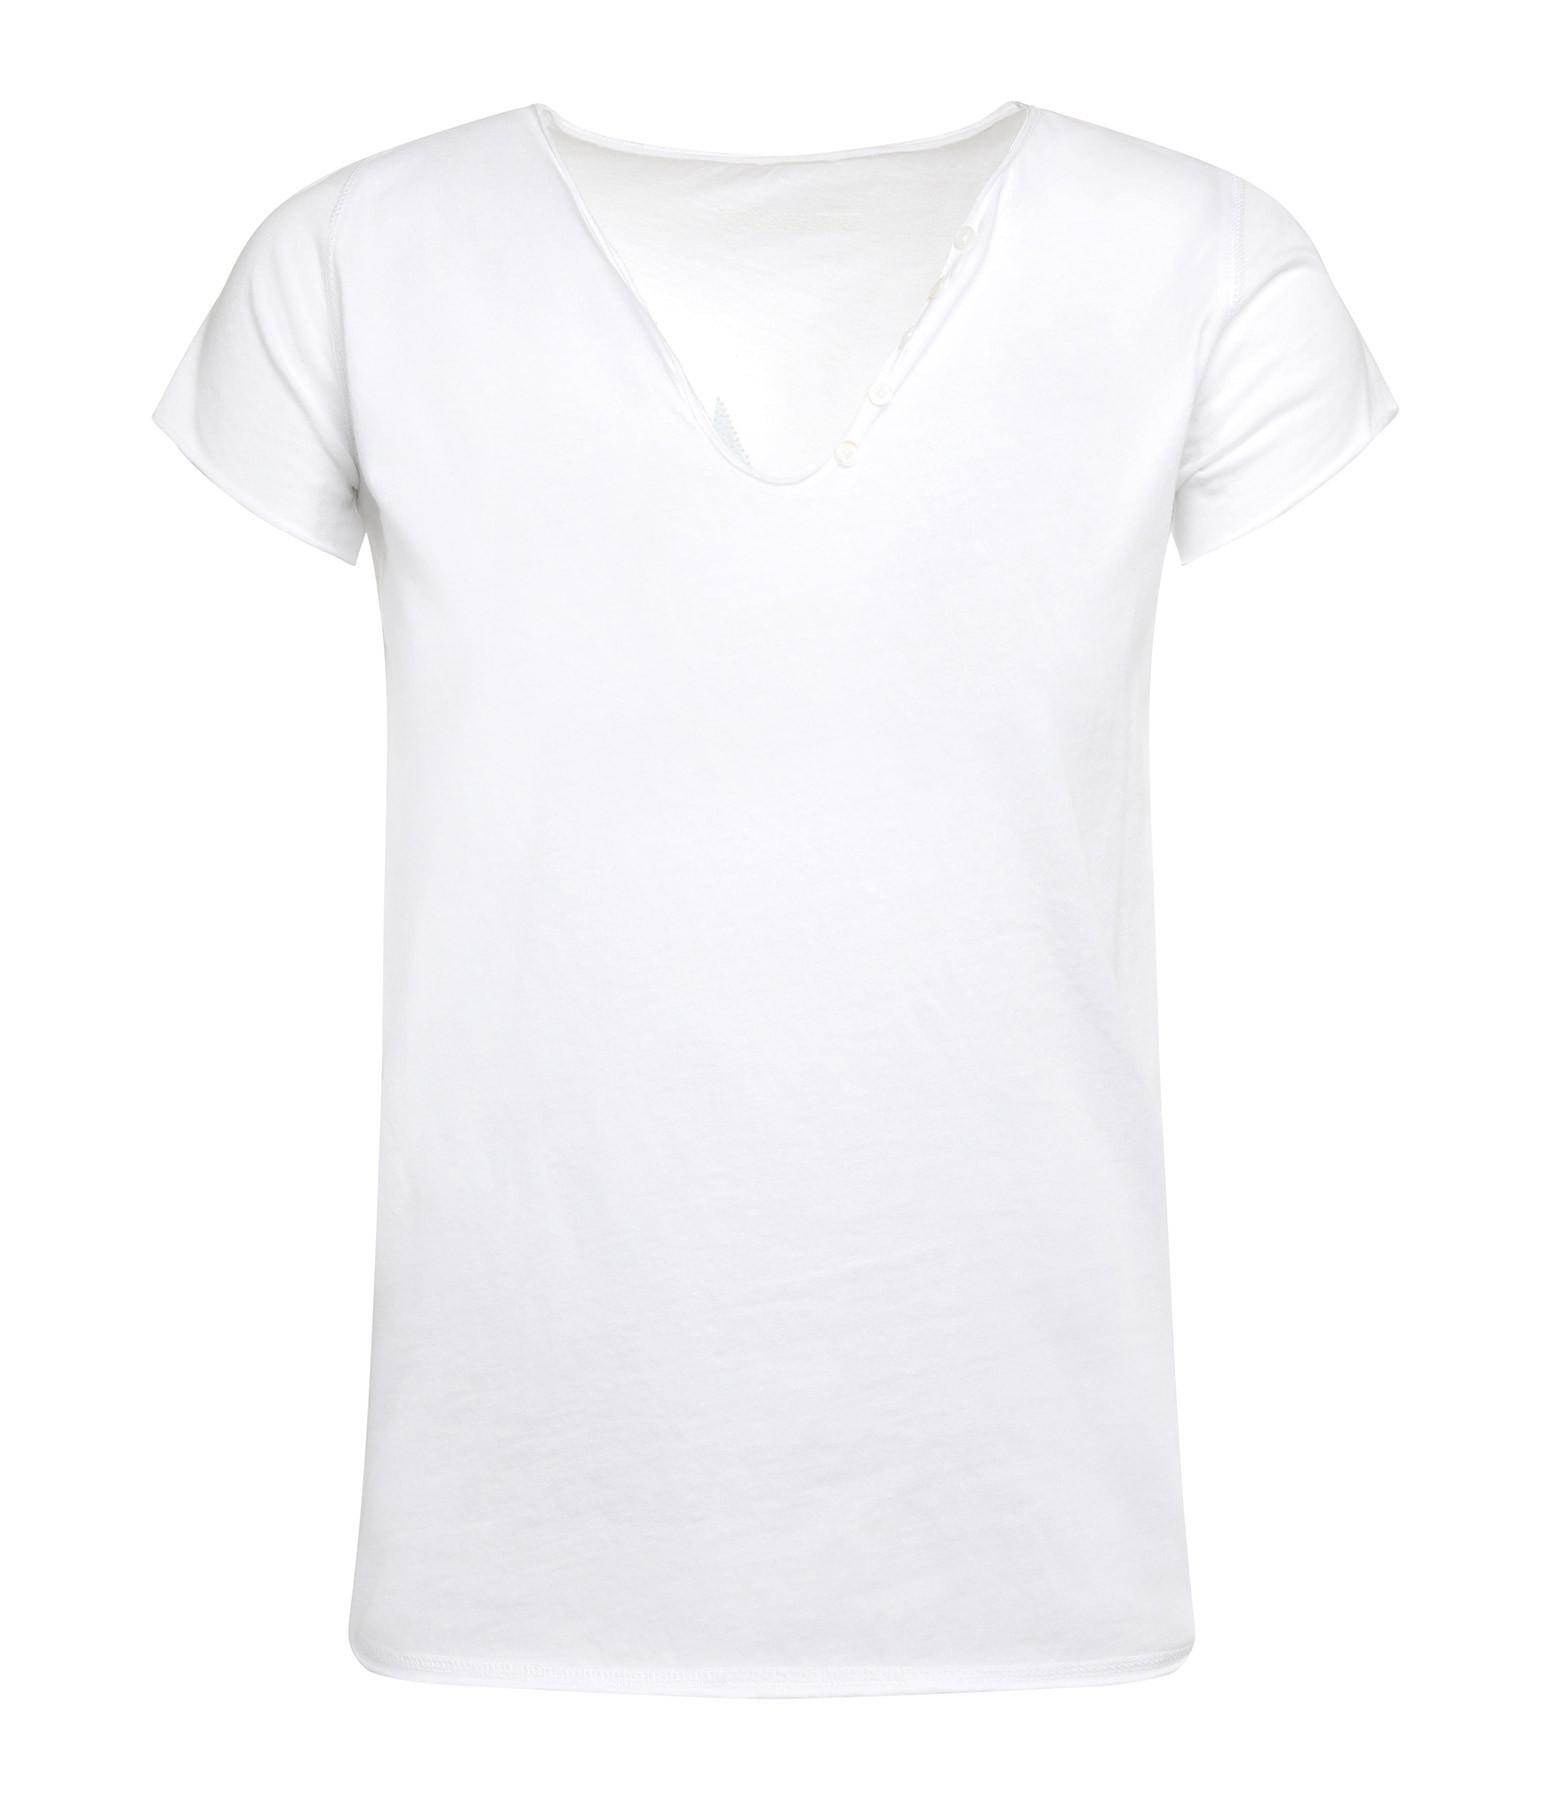 ZADIG & VOLTAIRE - Tee-shirt Tunisien Lov Coton Blanc